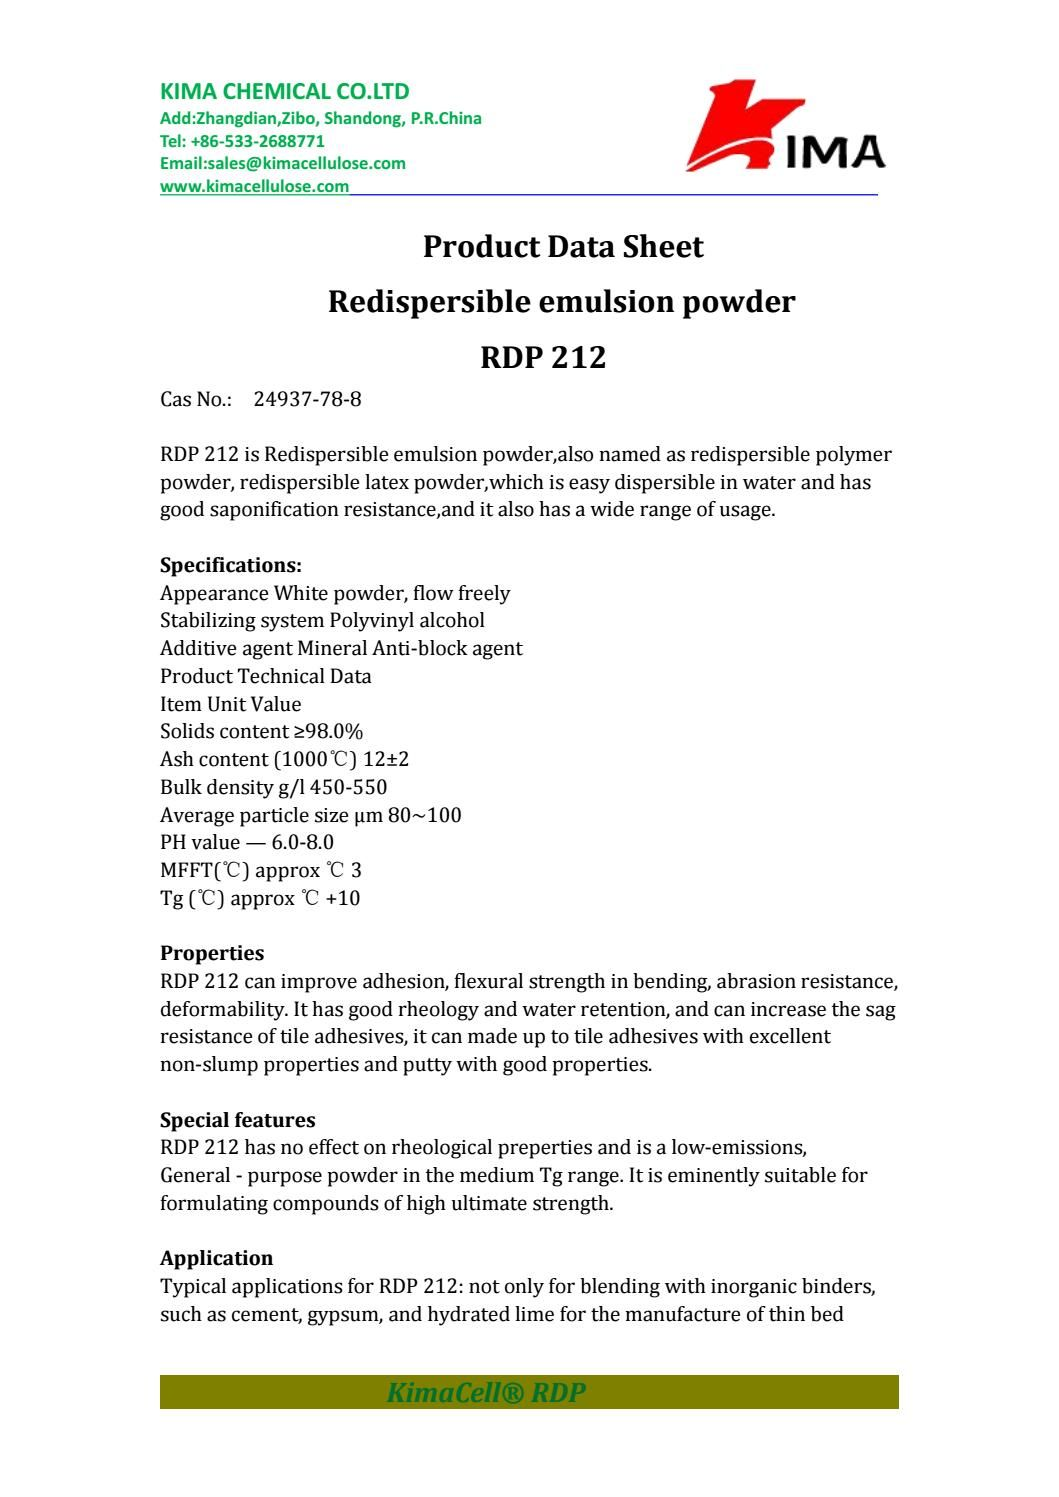 Redispersible Polymer Powder Rdp 212 Sales Kimacellulose Com Zibo Data Sheets Polymer